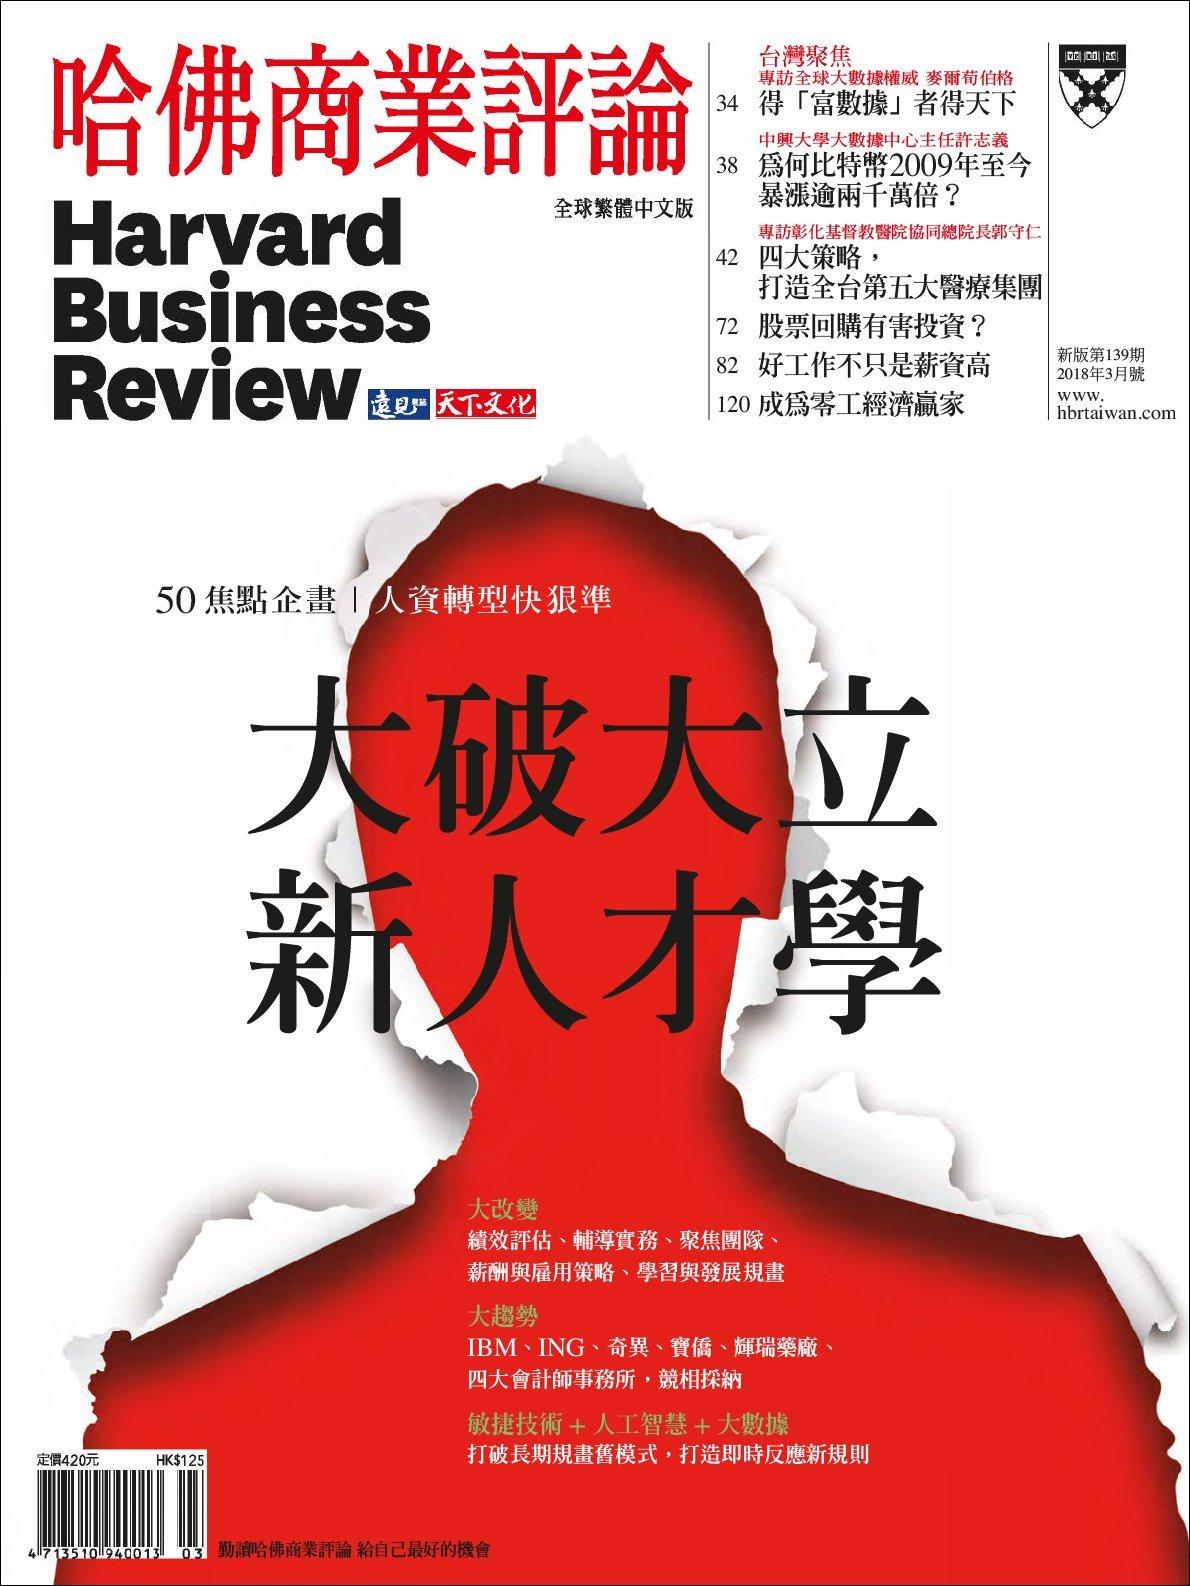 Harvard Business Review Complex Chinese Edition 哈佛商業評論 Digital